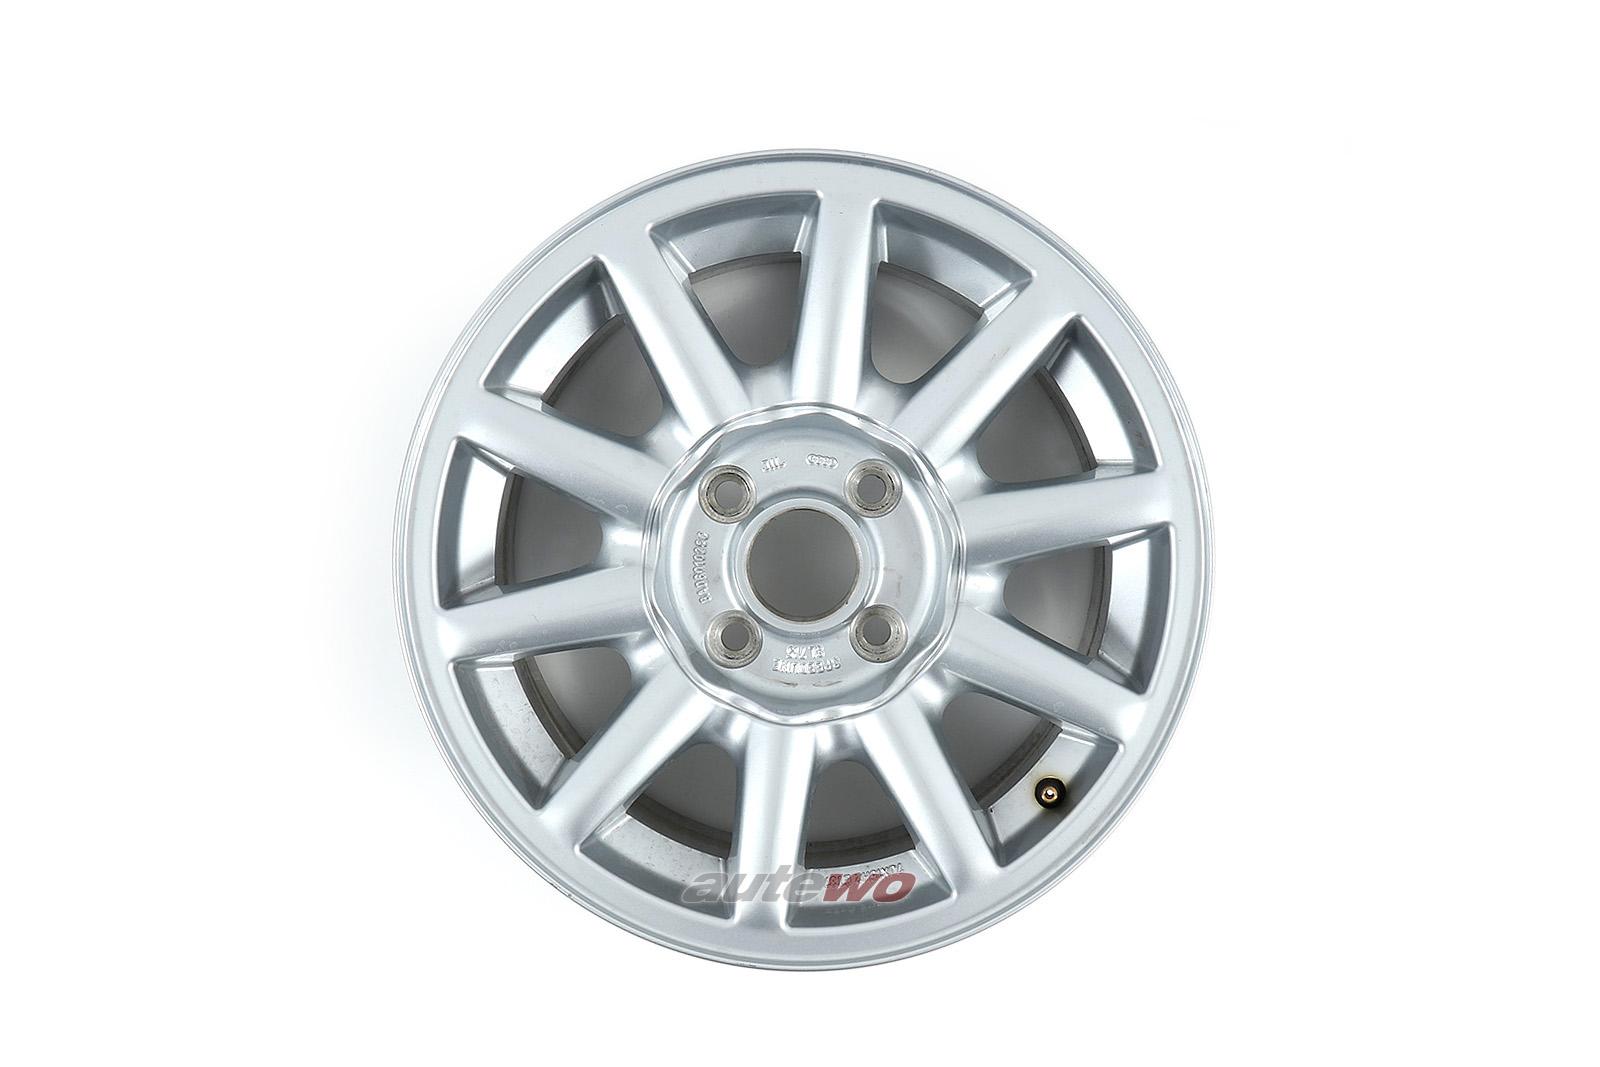 8A0601025C NEU Audi 80 B4/Coupe/Cabrio 10-Speichen-Alufelge 7x15 ET37 4x108